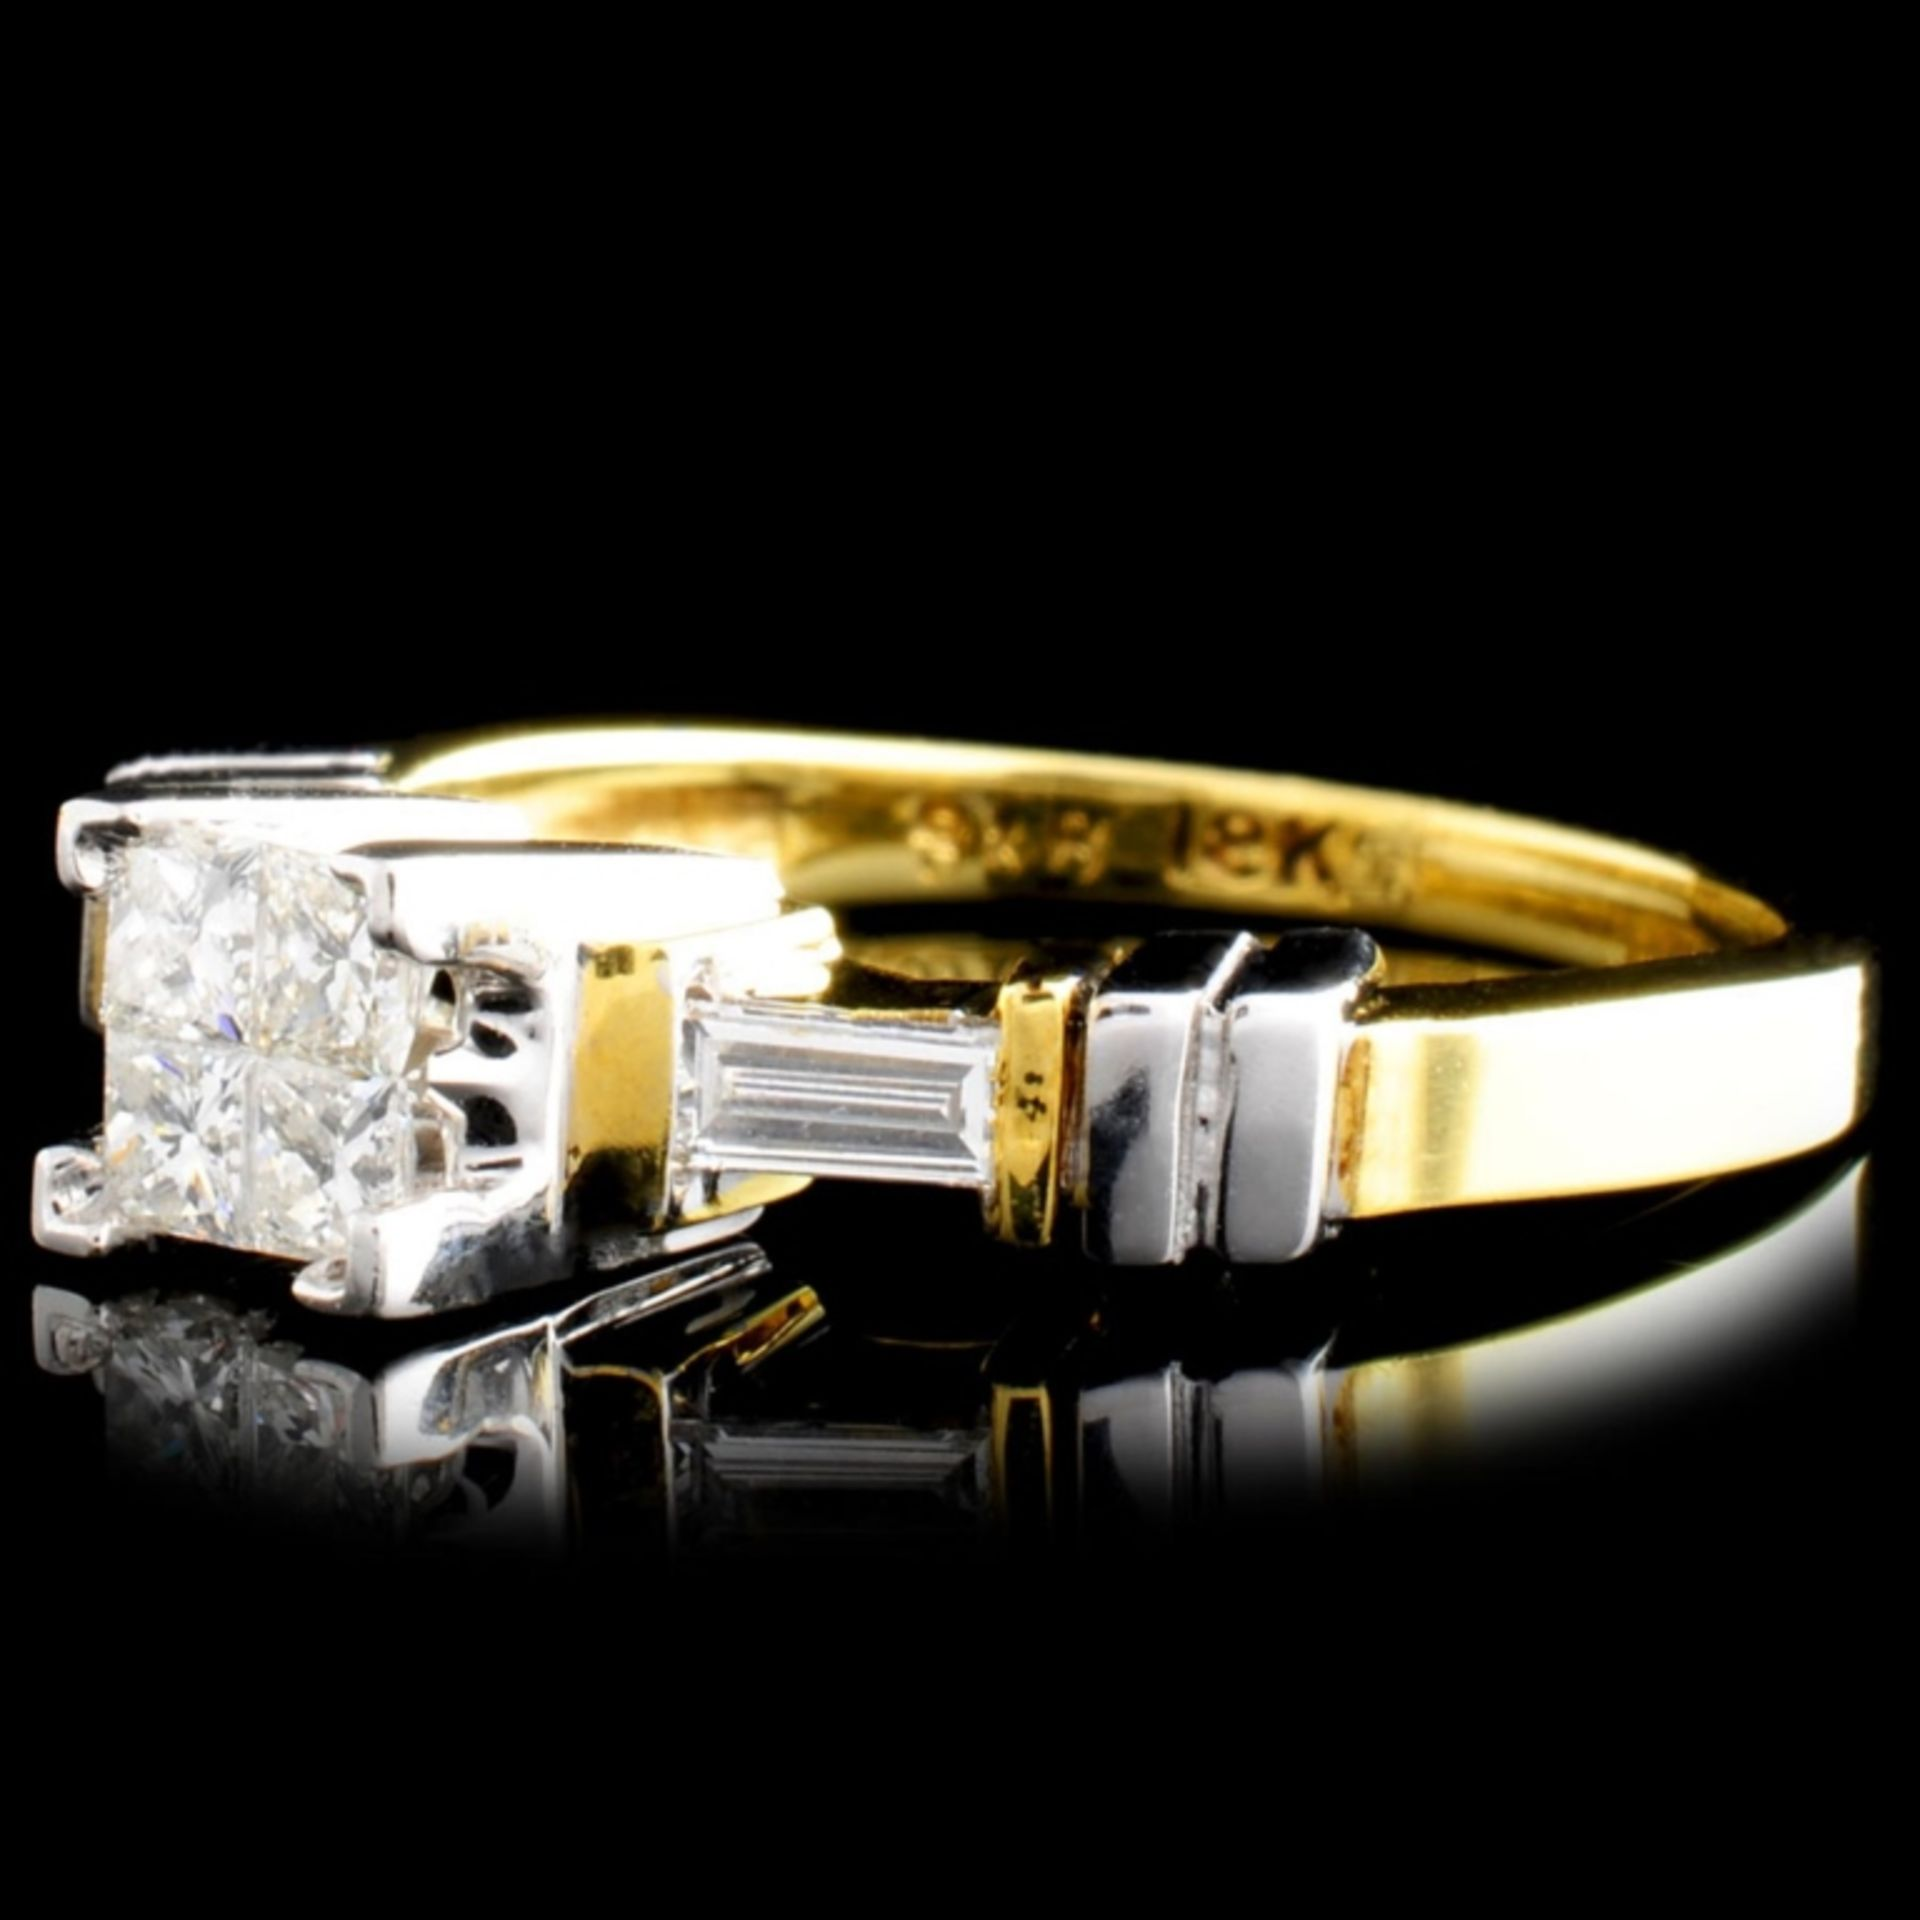 18K Gold 0.50ctw Diamond Ring - Image 2 of 4